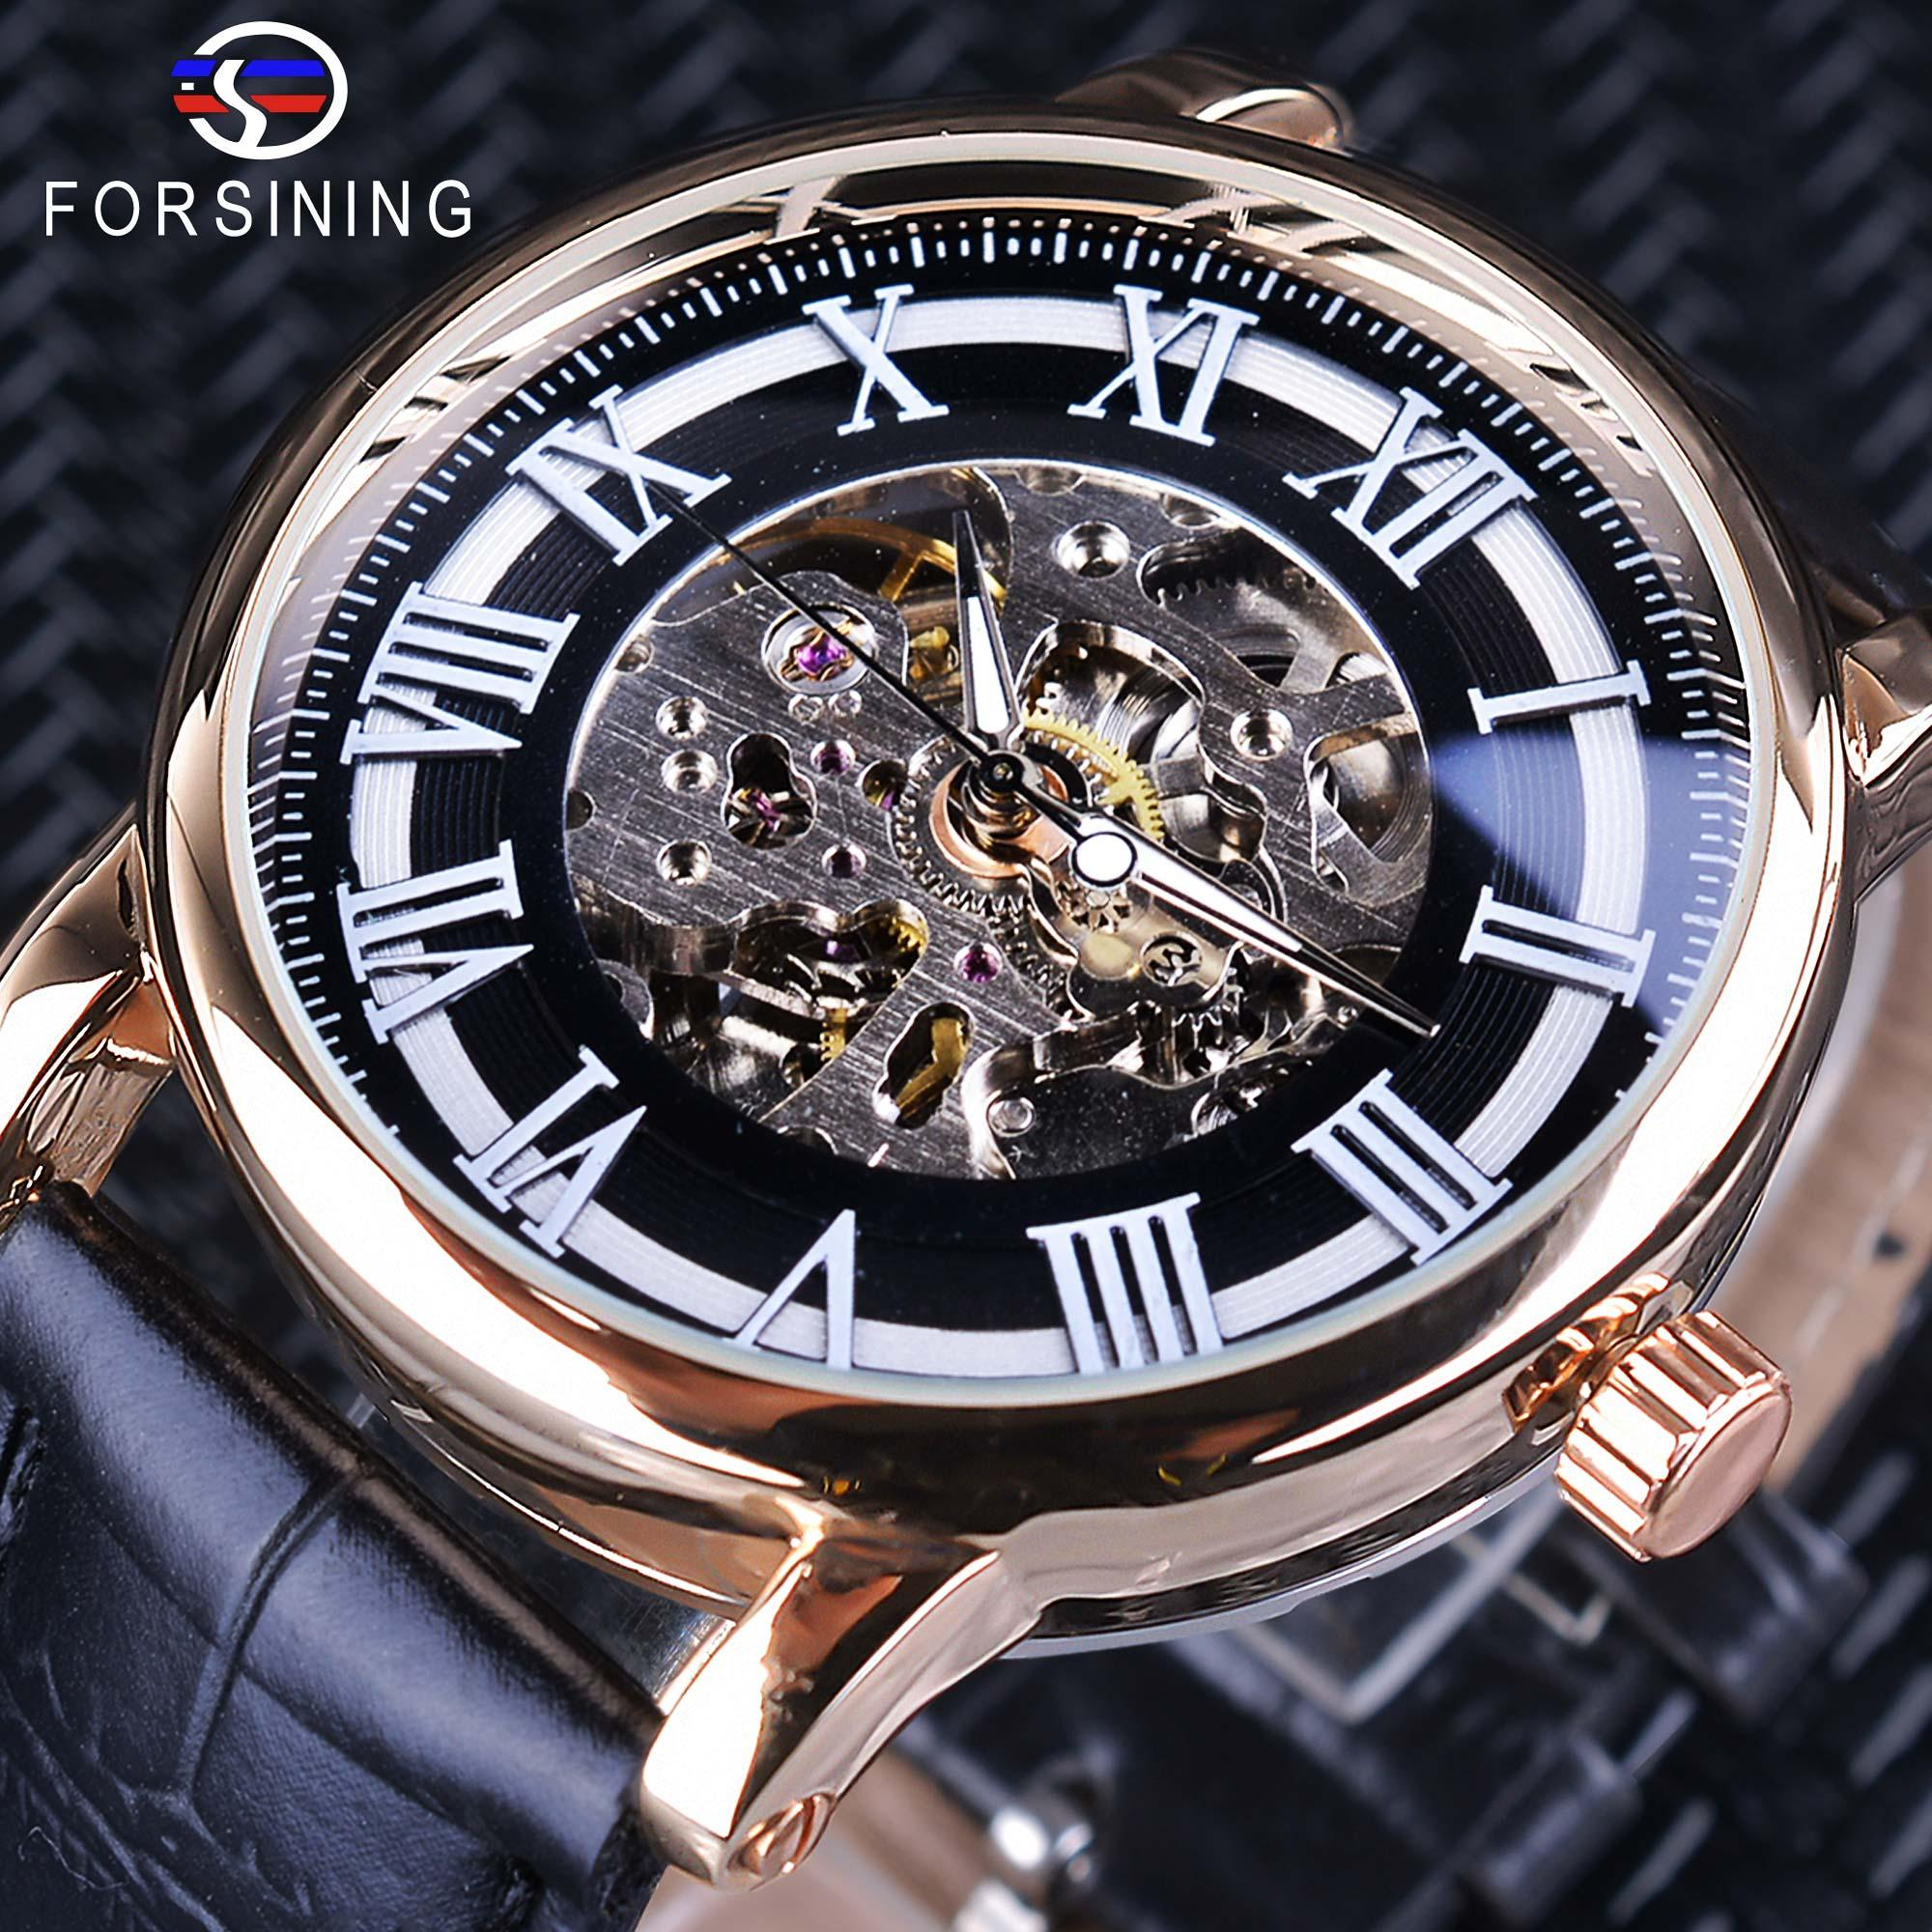 154d6bb2d3c Compre Forsining 2018 Relógios Automáticos Dos Homens Romanos Retro Top  Marca De Luxo Esqueleto Preto Luminoso Relógio De Pulso Relógio Masculino  Relógio ...